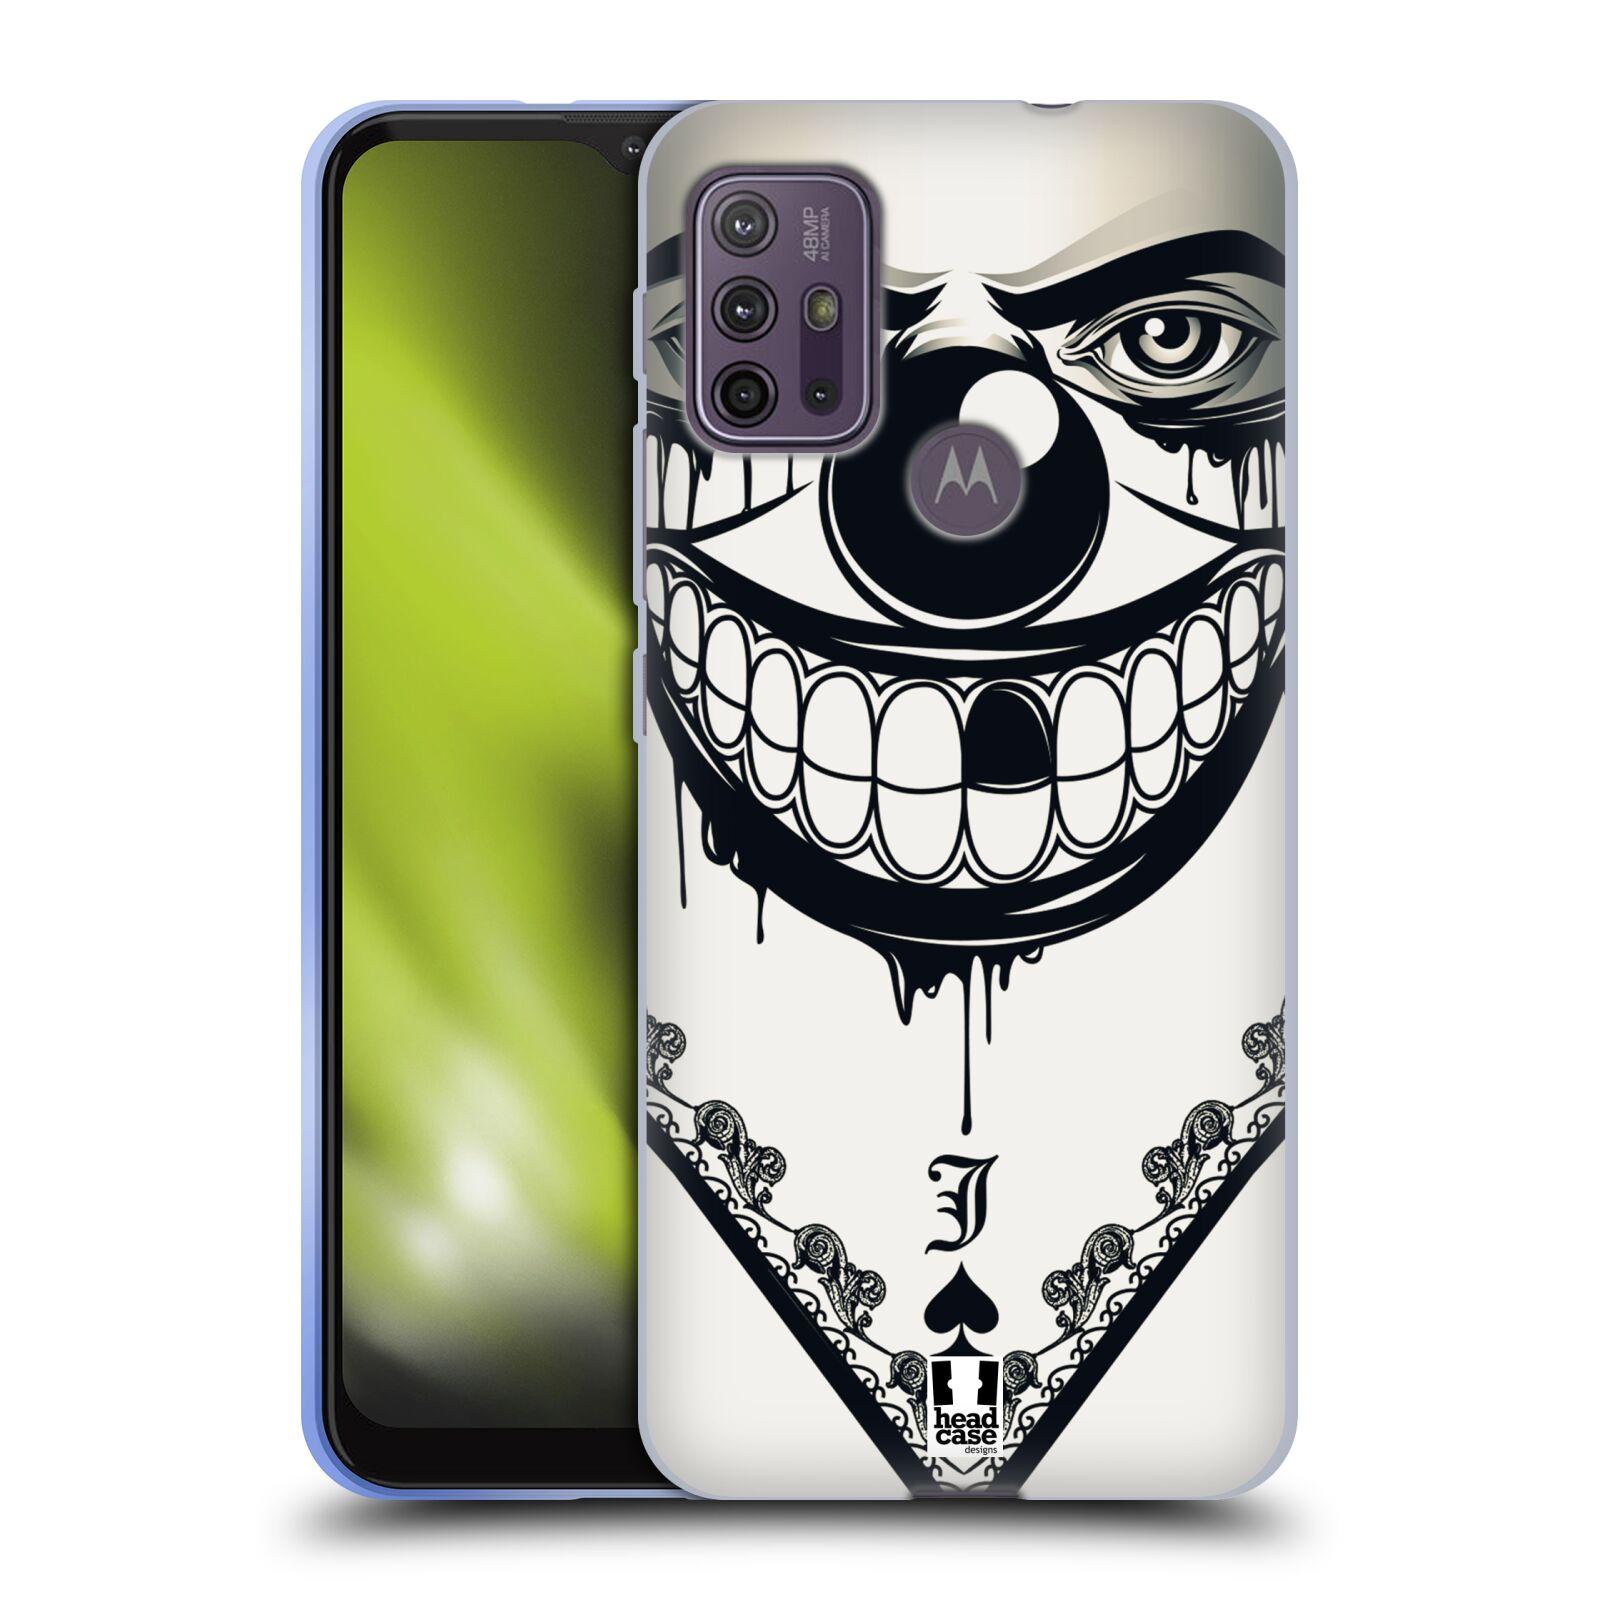 Silikonové pouzdro na mobil Motorola Moto G10 / G30 - Head Case - ZLEJ KLAUN